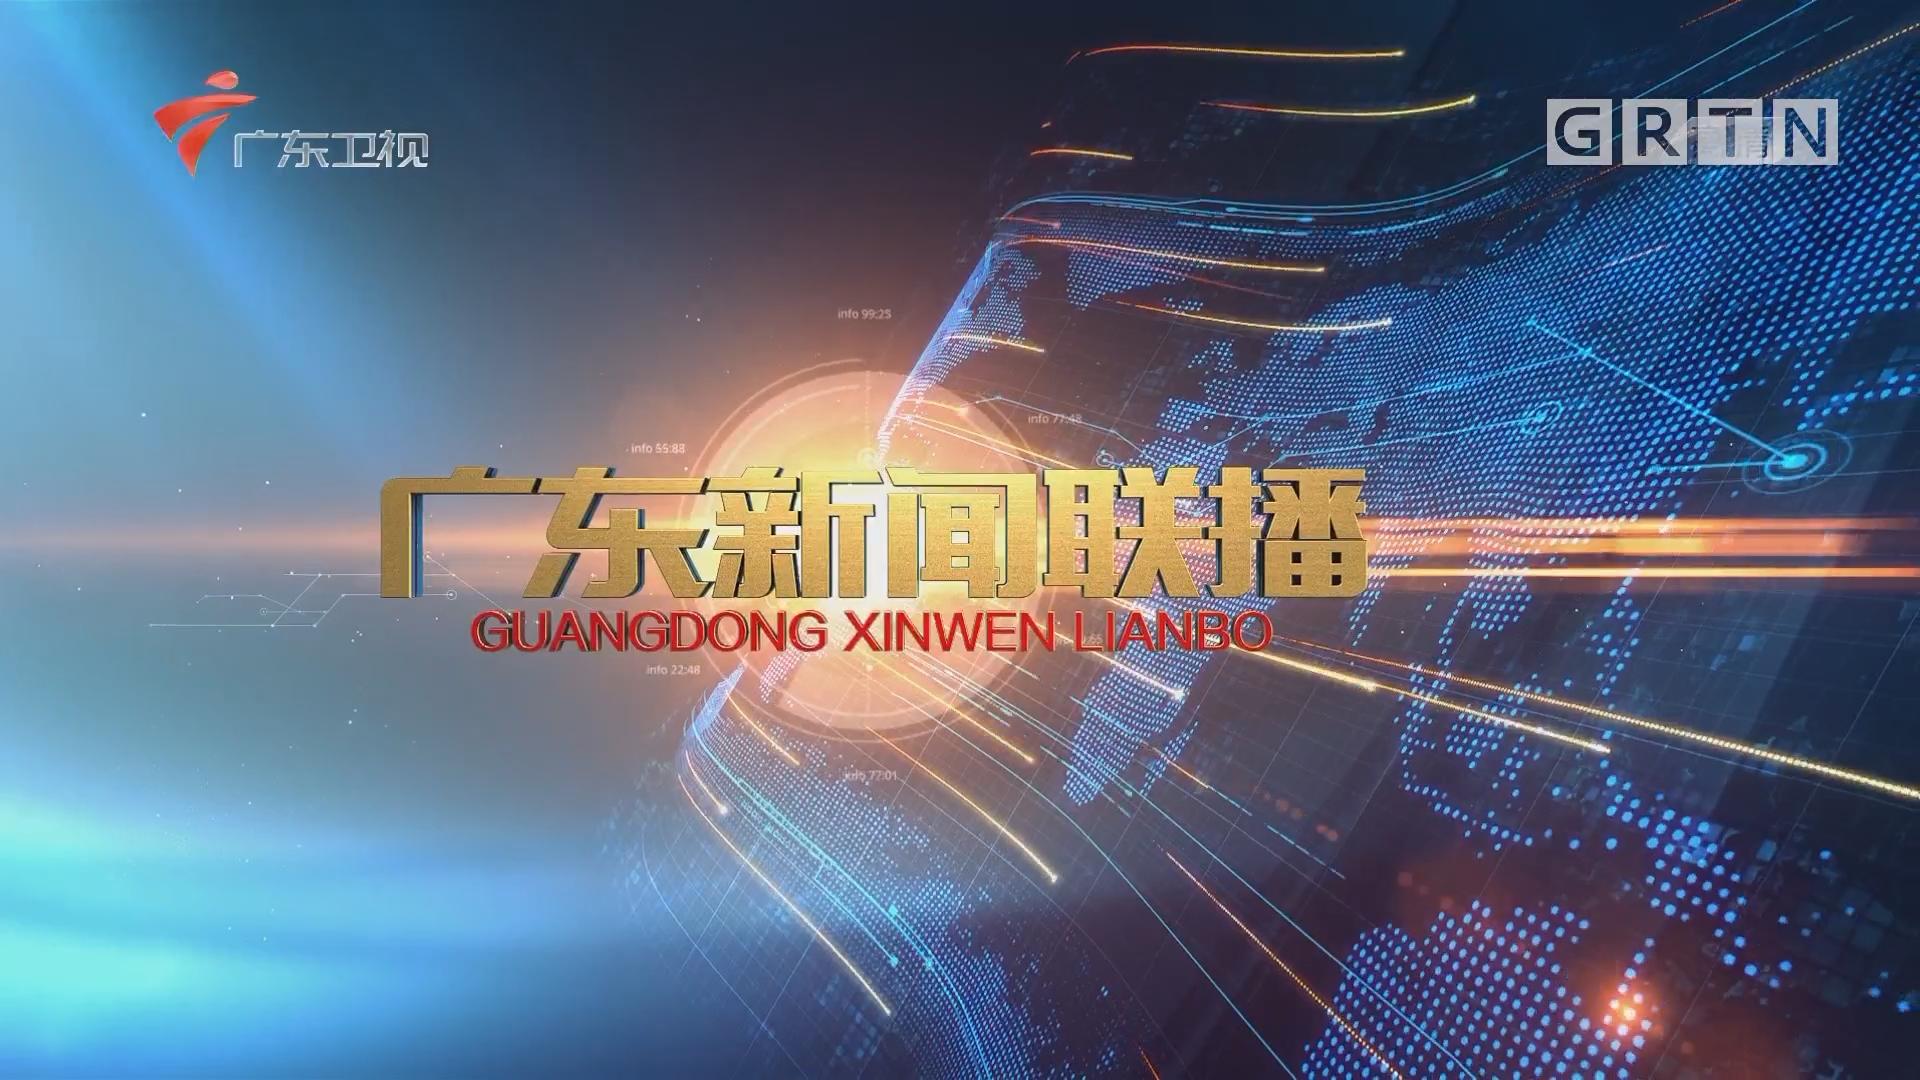 [HD][2018-03-06]广东新闻联播:广东代表团举行全体会议并向中外媒体开放 李希马兴瑞等回答记者提问